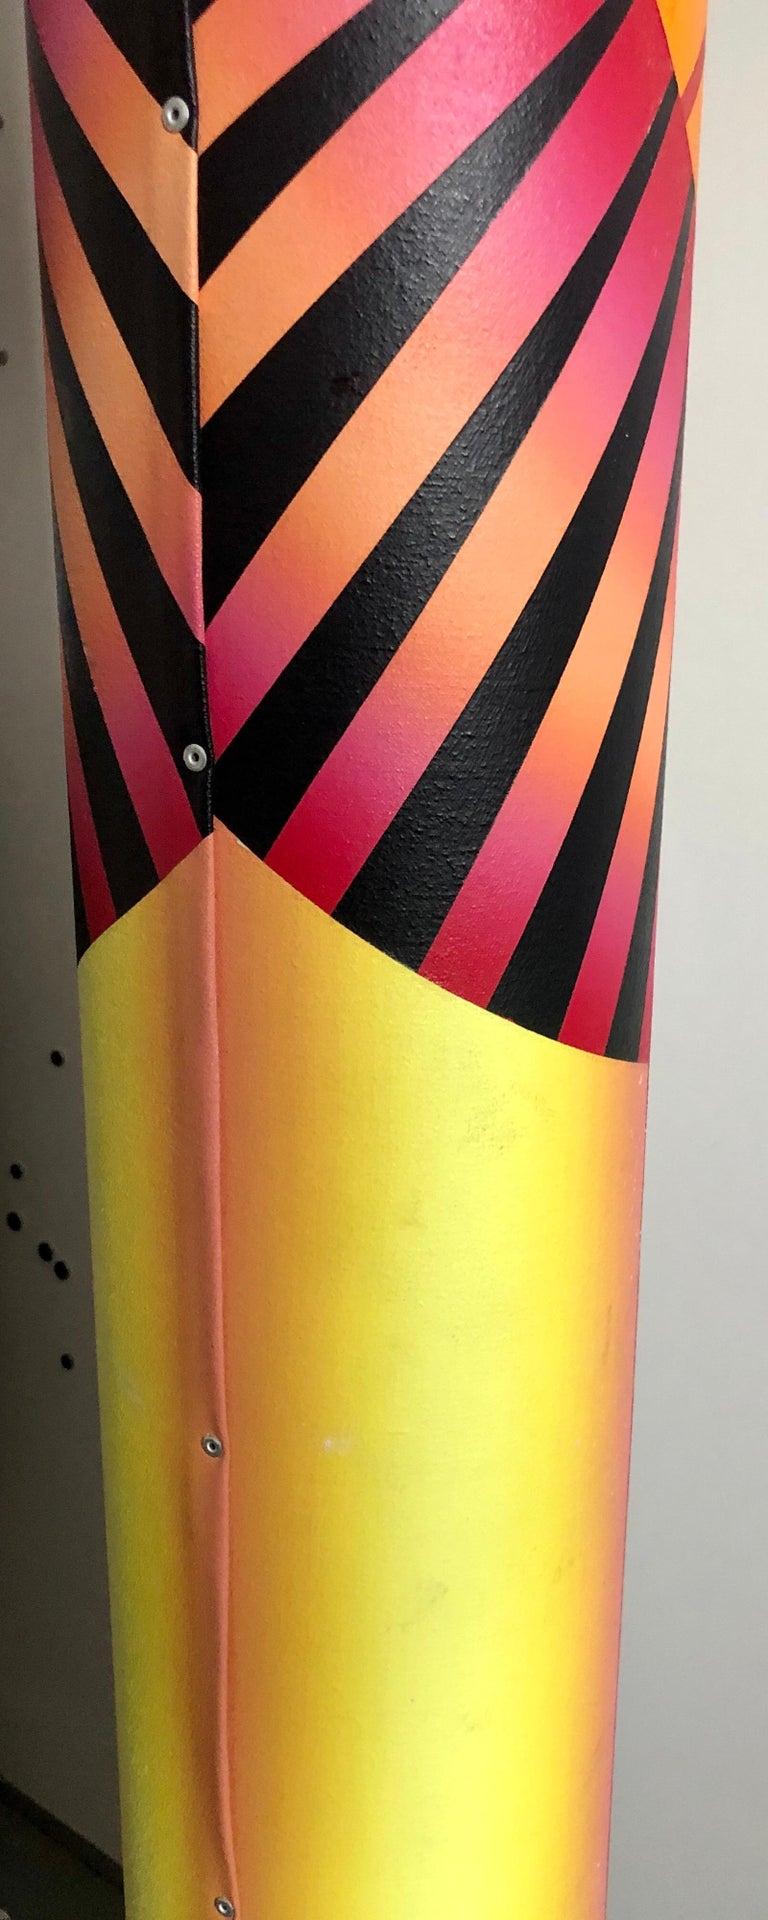 Abstract Geometric Shaped Canvas Painting Sculpture Memphis Milano Era 1980s Art 5